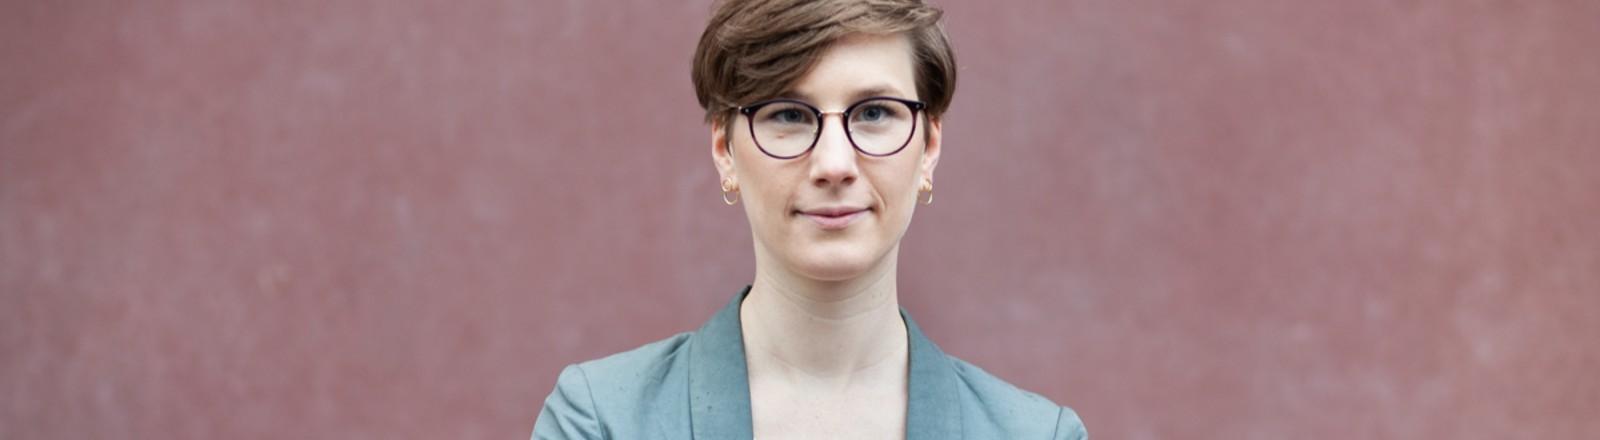 Lydia Heilen, Umweltpsychologin